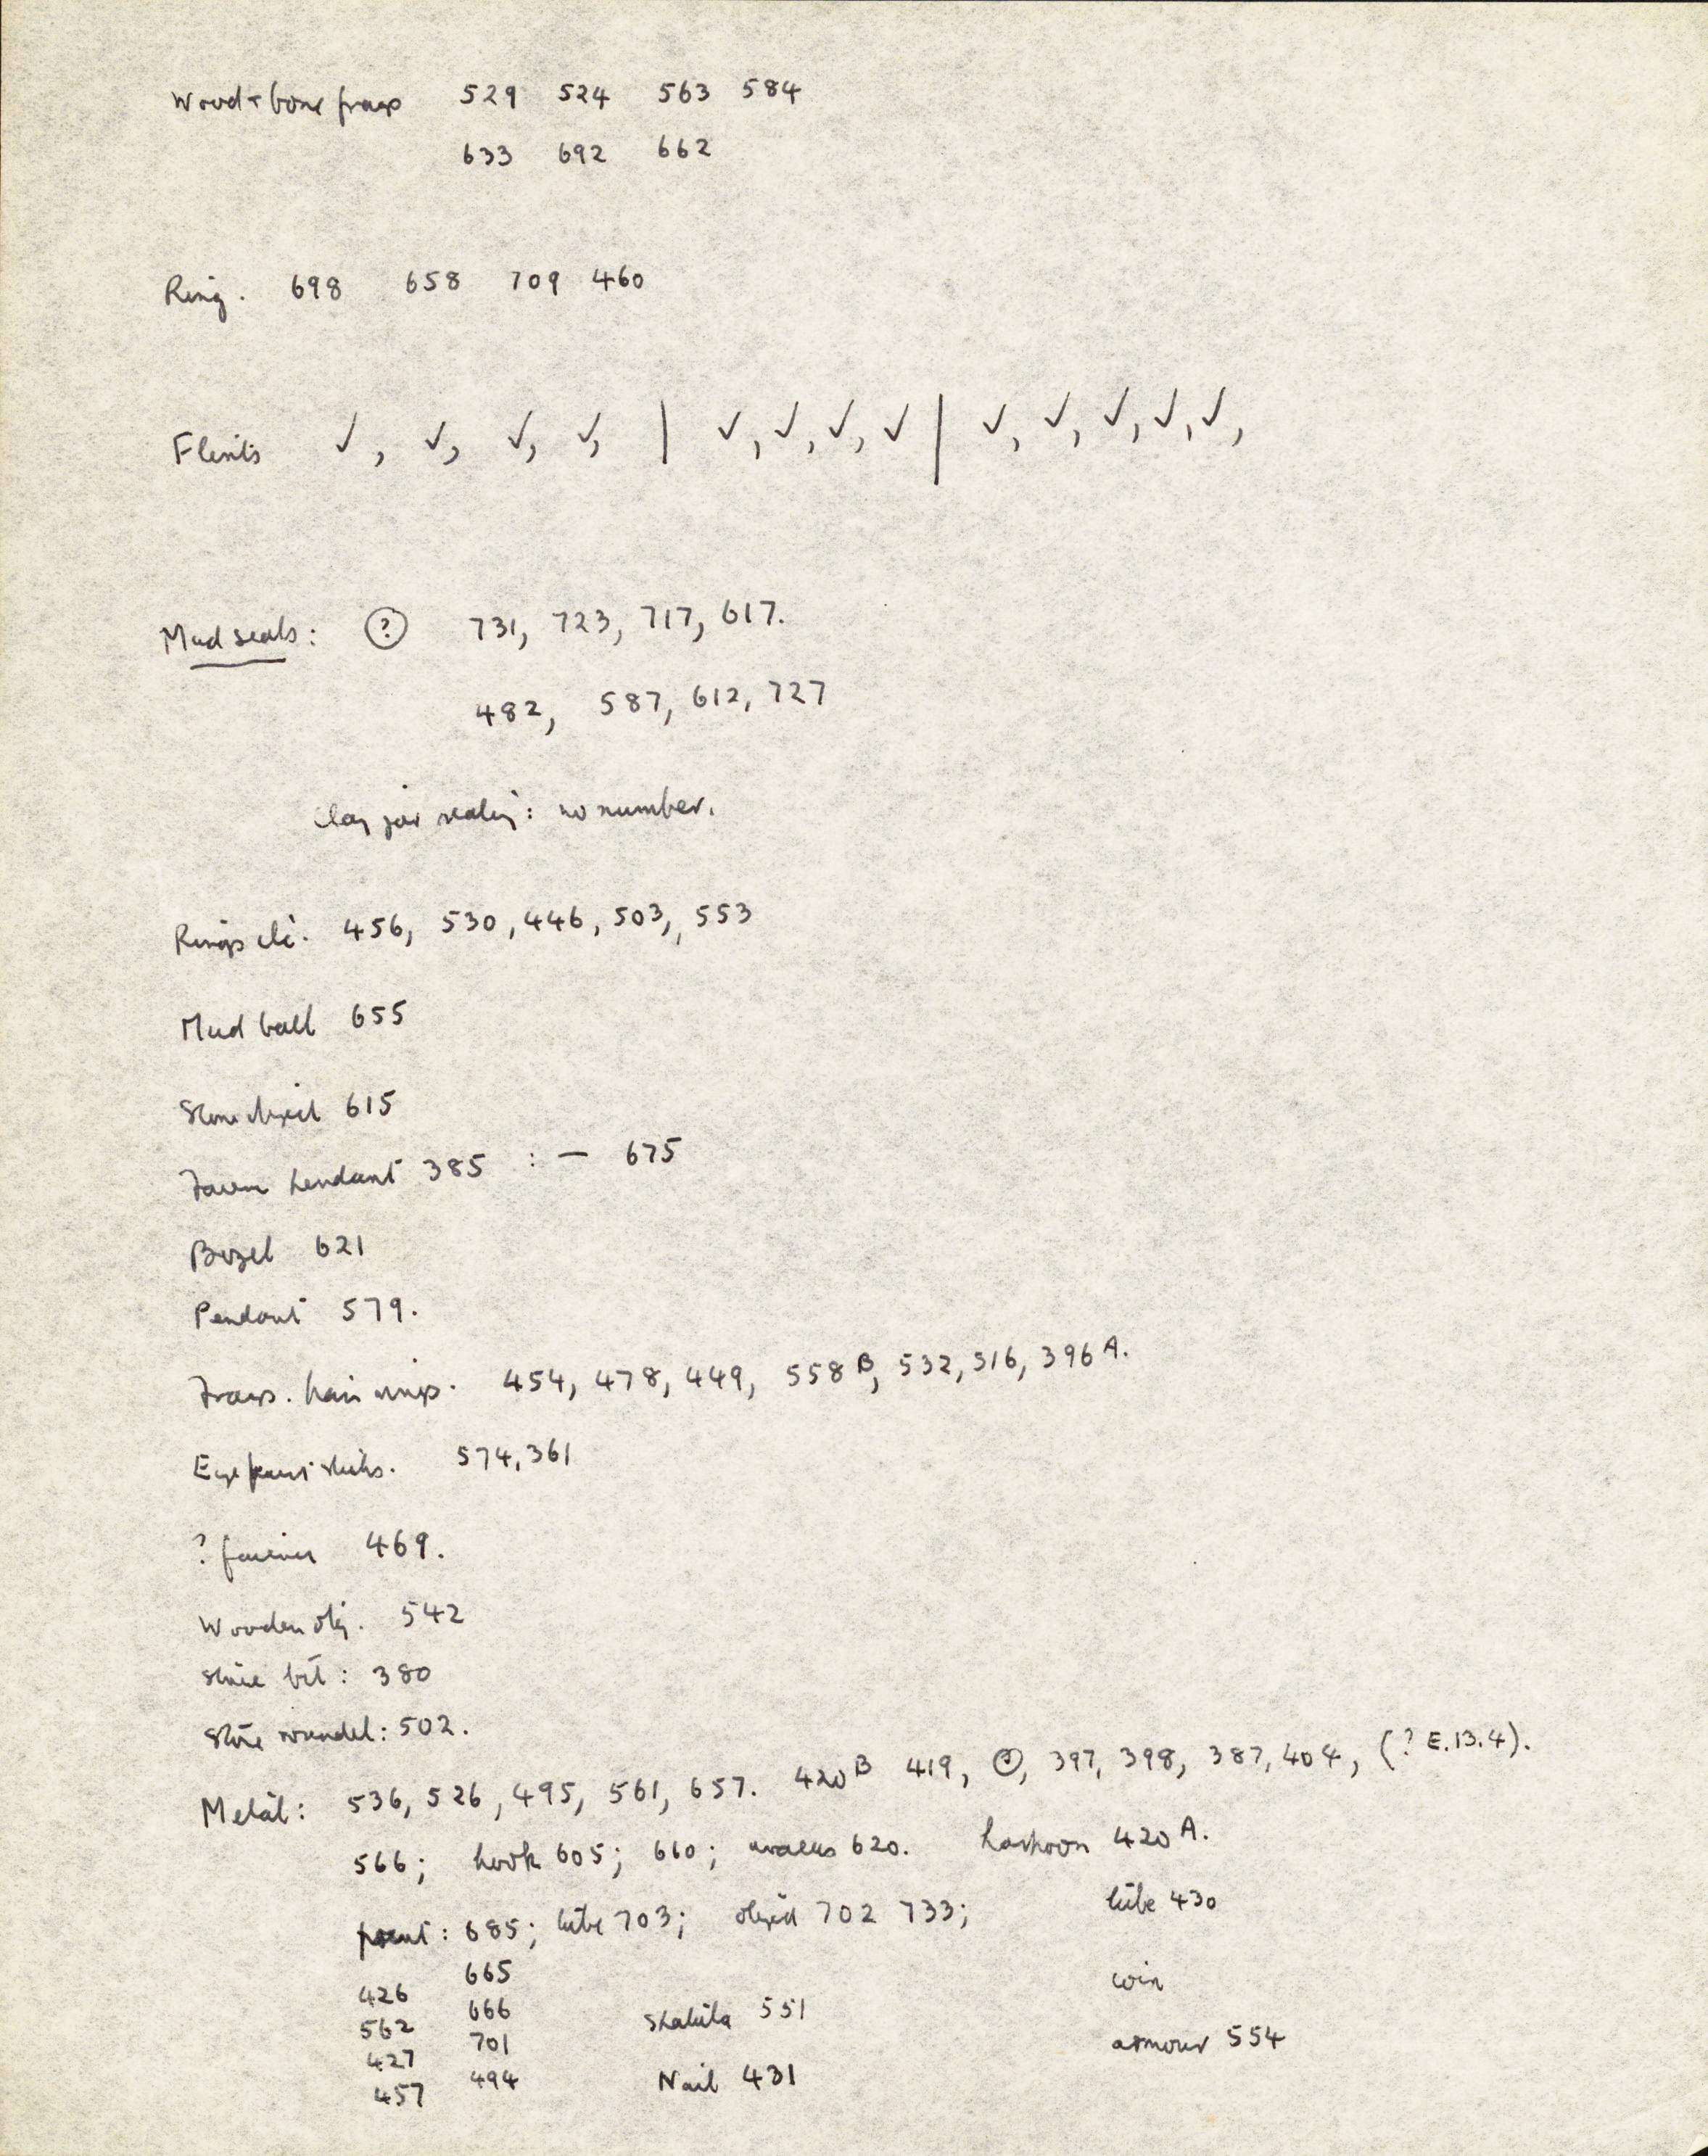 1947-54 Amarah West DIST.66.24b